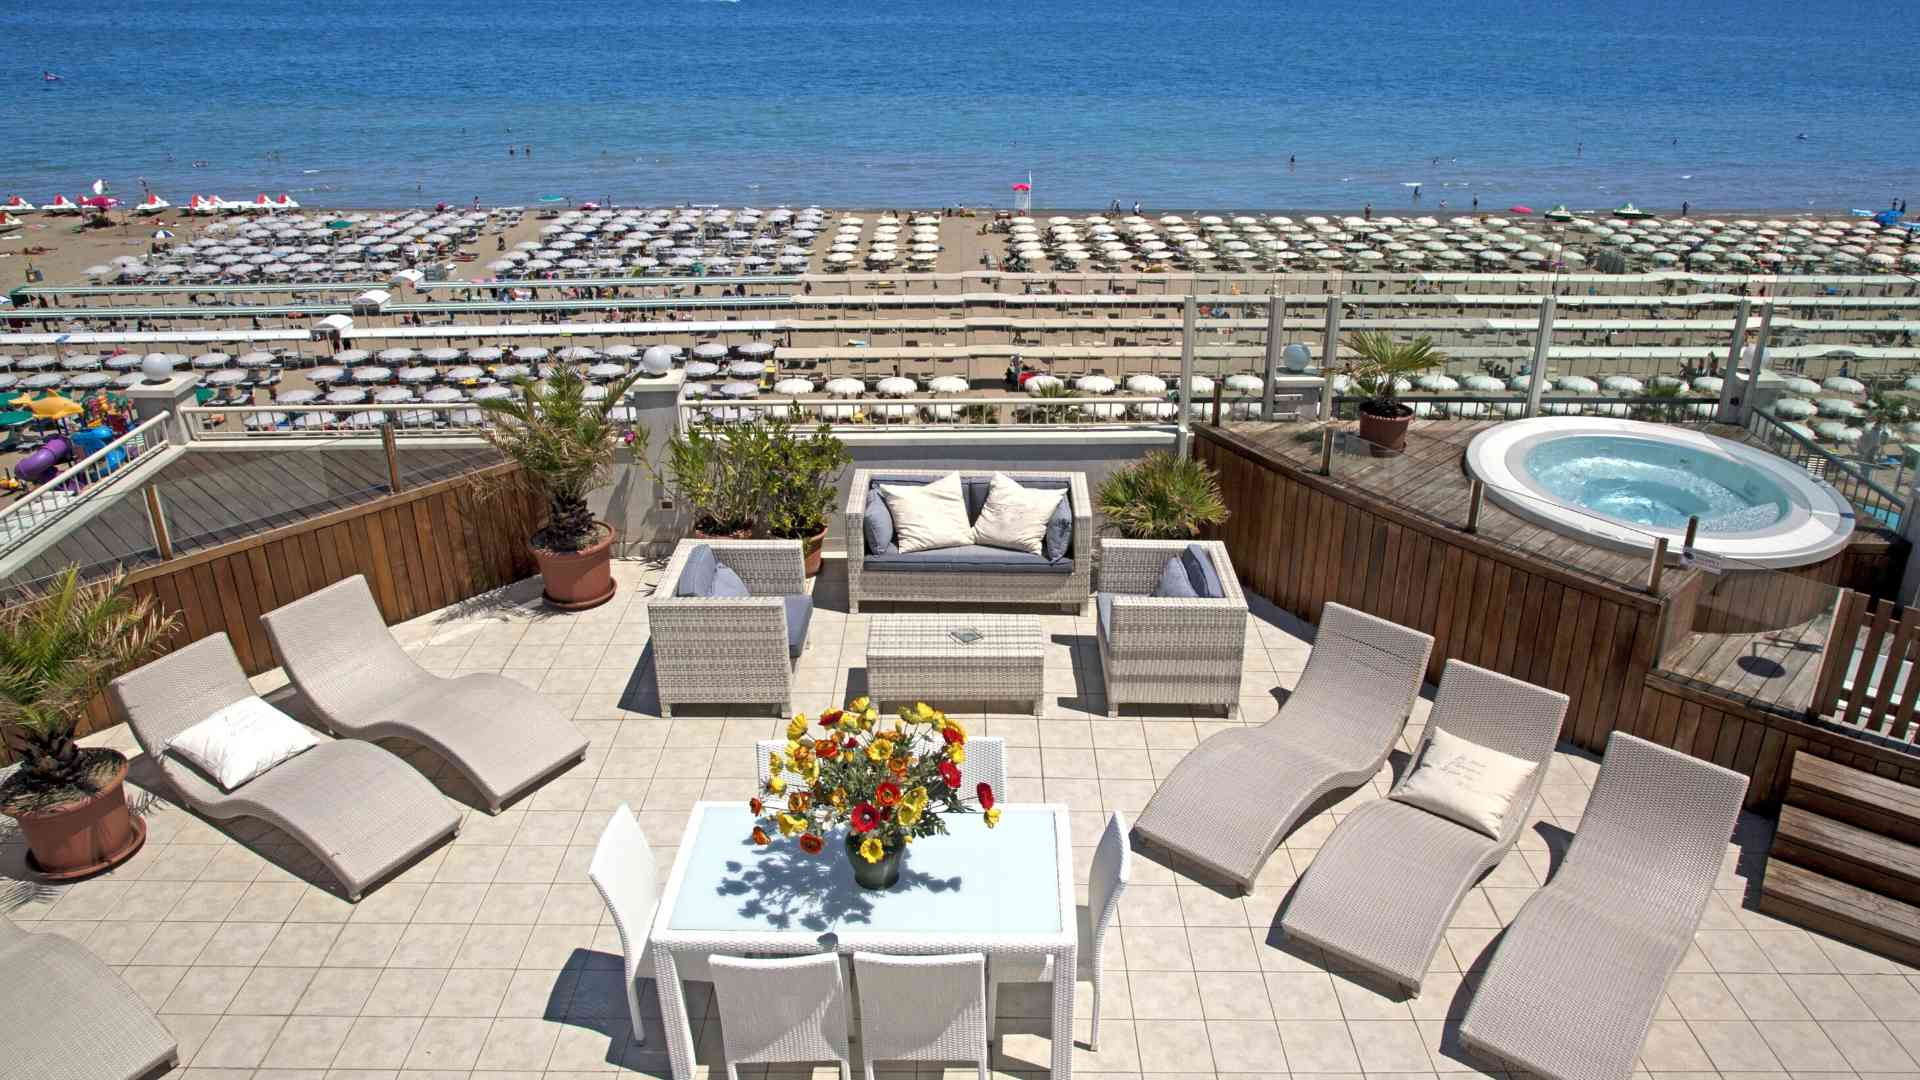 EVIDENZA_Spiaggia_Hotel Cabianca